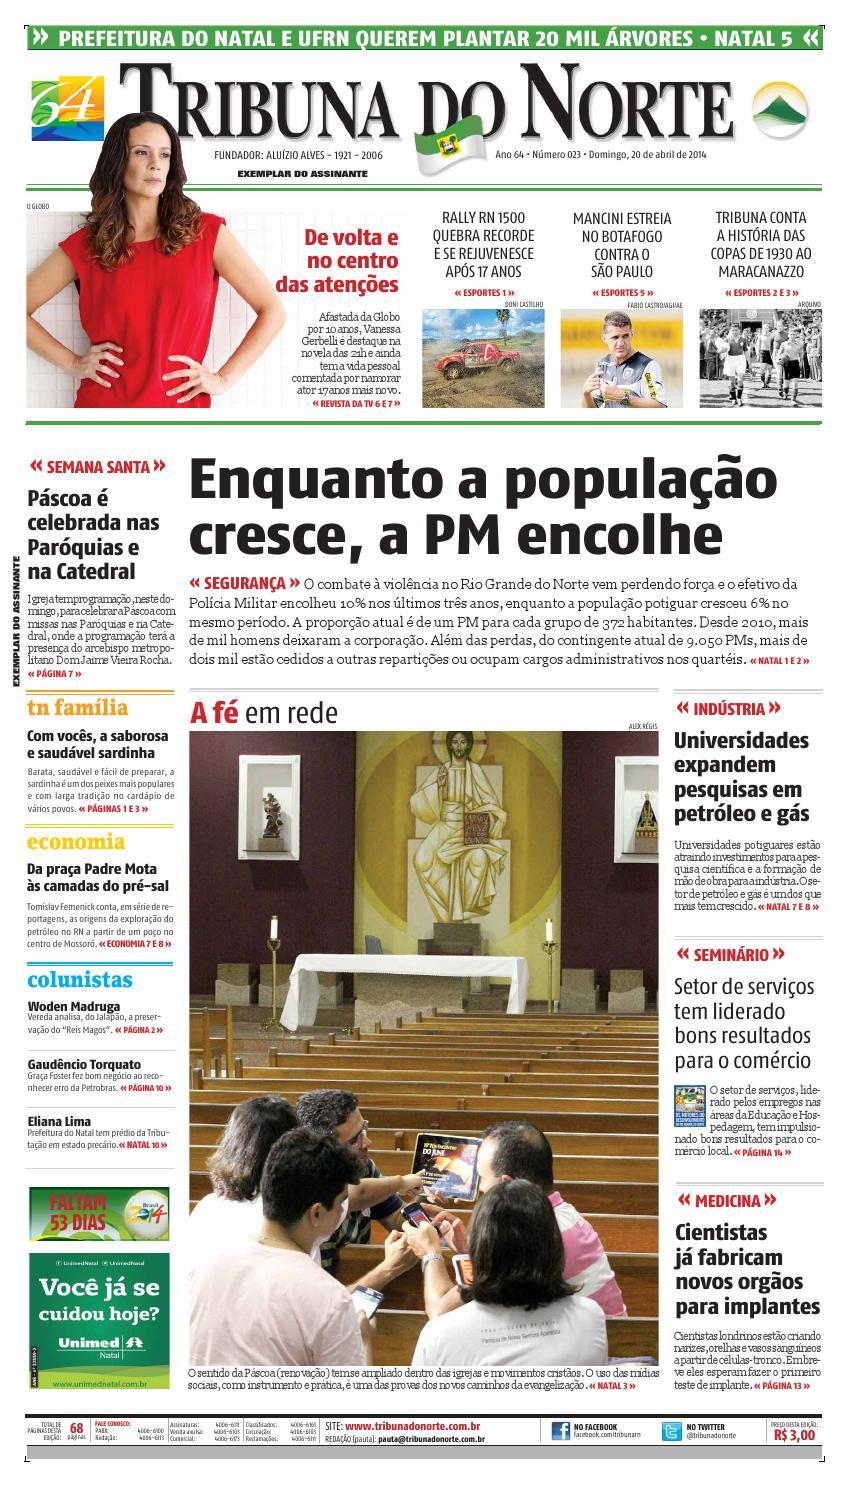 fc76d333f20ab Tribuna do Norte - 20 04 2014 by Empresa Jornalística Tribuna do Norte Ltda  - issuu